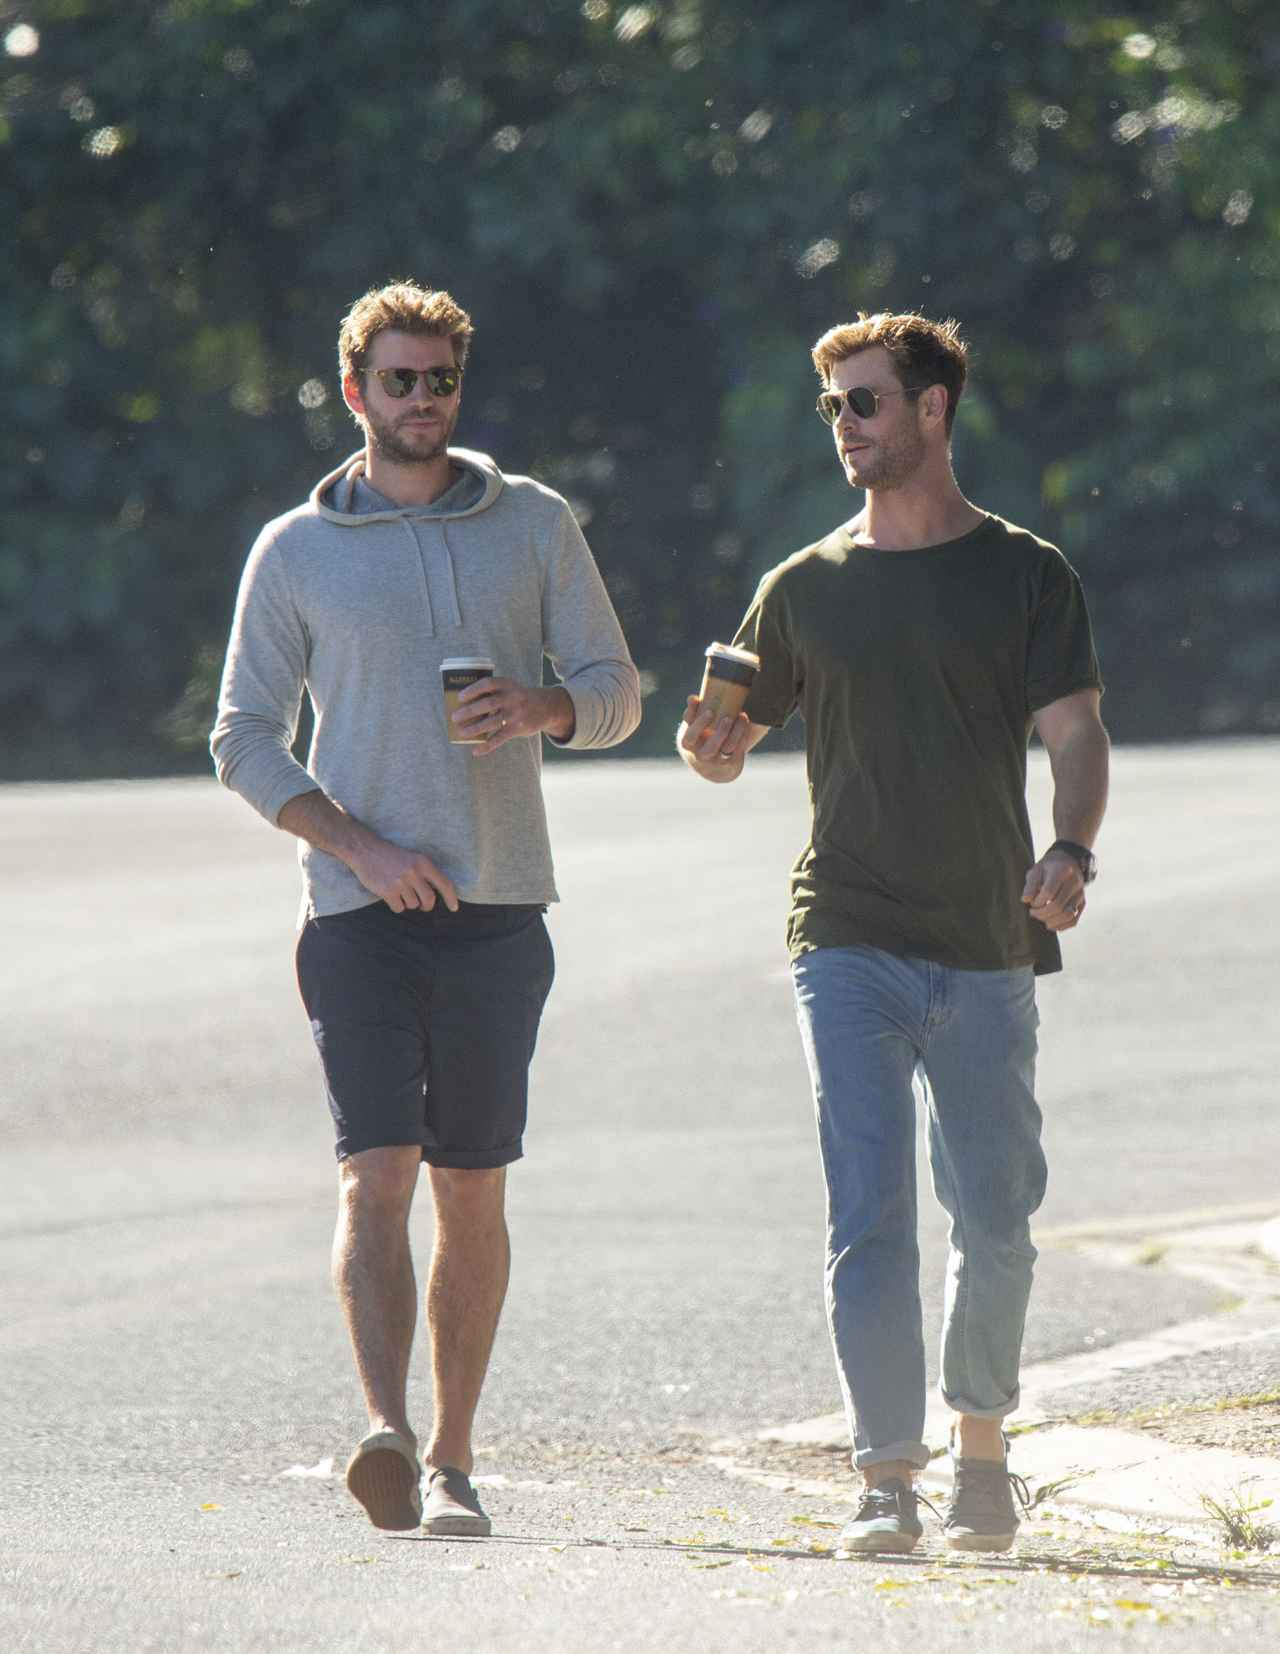 Images : 11番目の画像 - クリス・ヘムズワース、弟リアムと散歩中に「元カノ」にばったり遭遇【写真アリ】 - フロントロウ -海外セレブ情報を発信